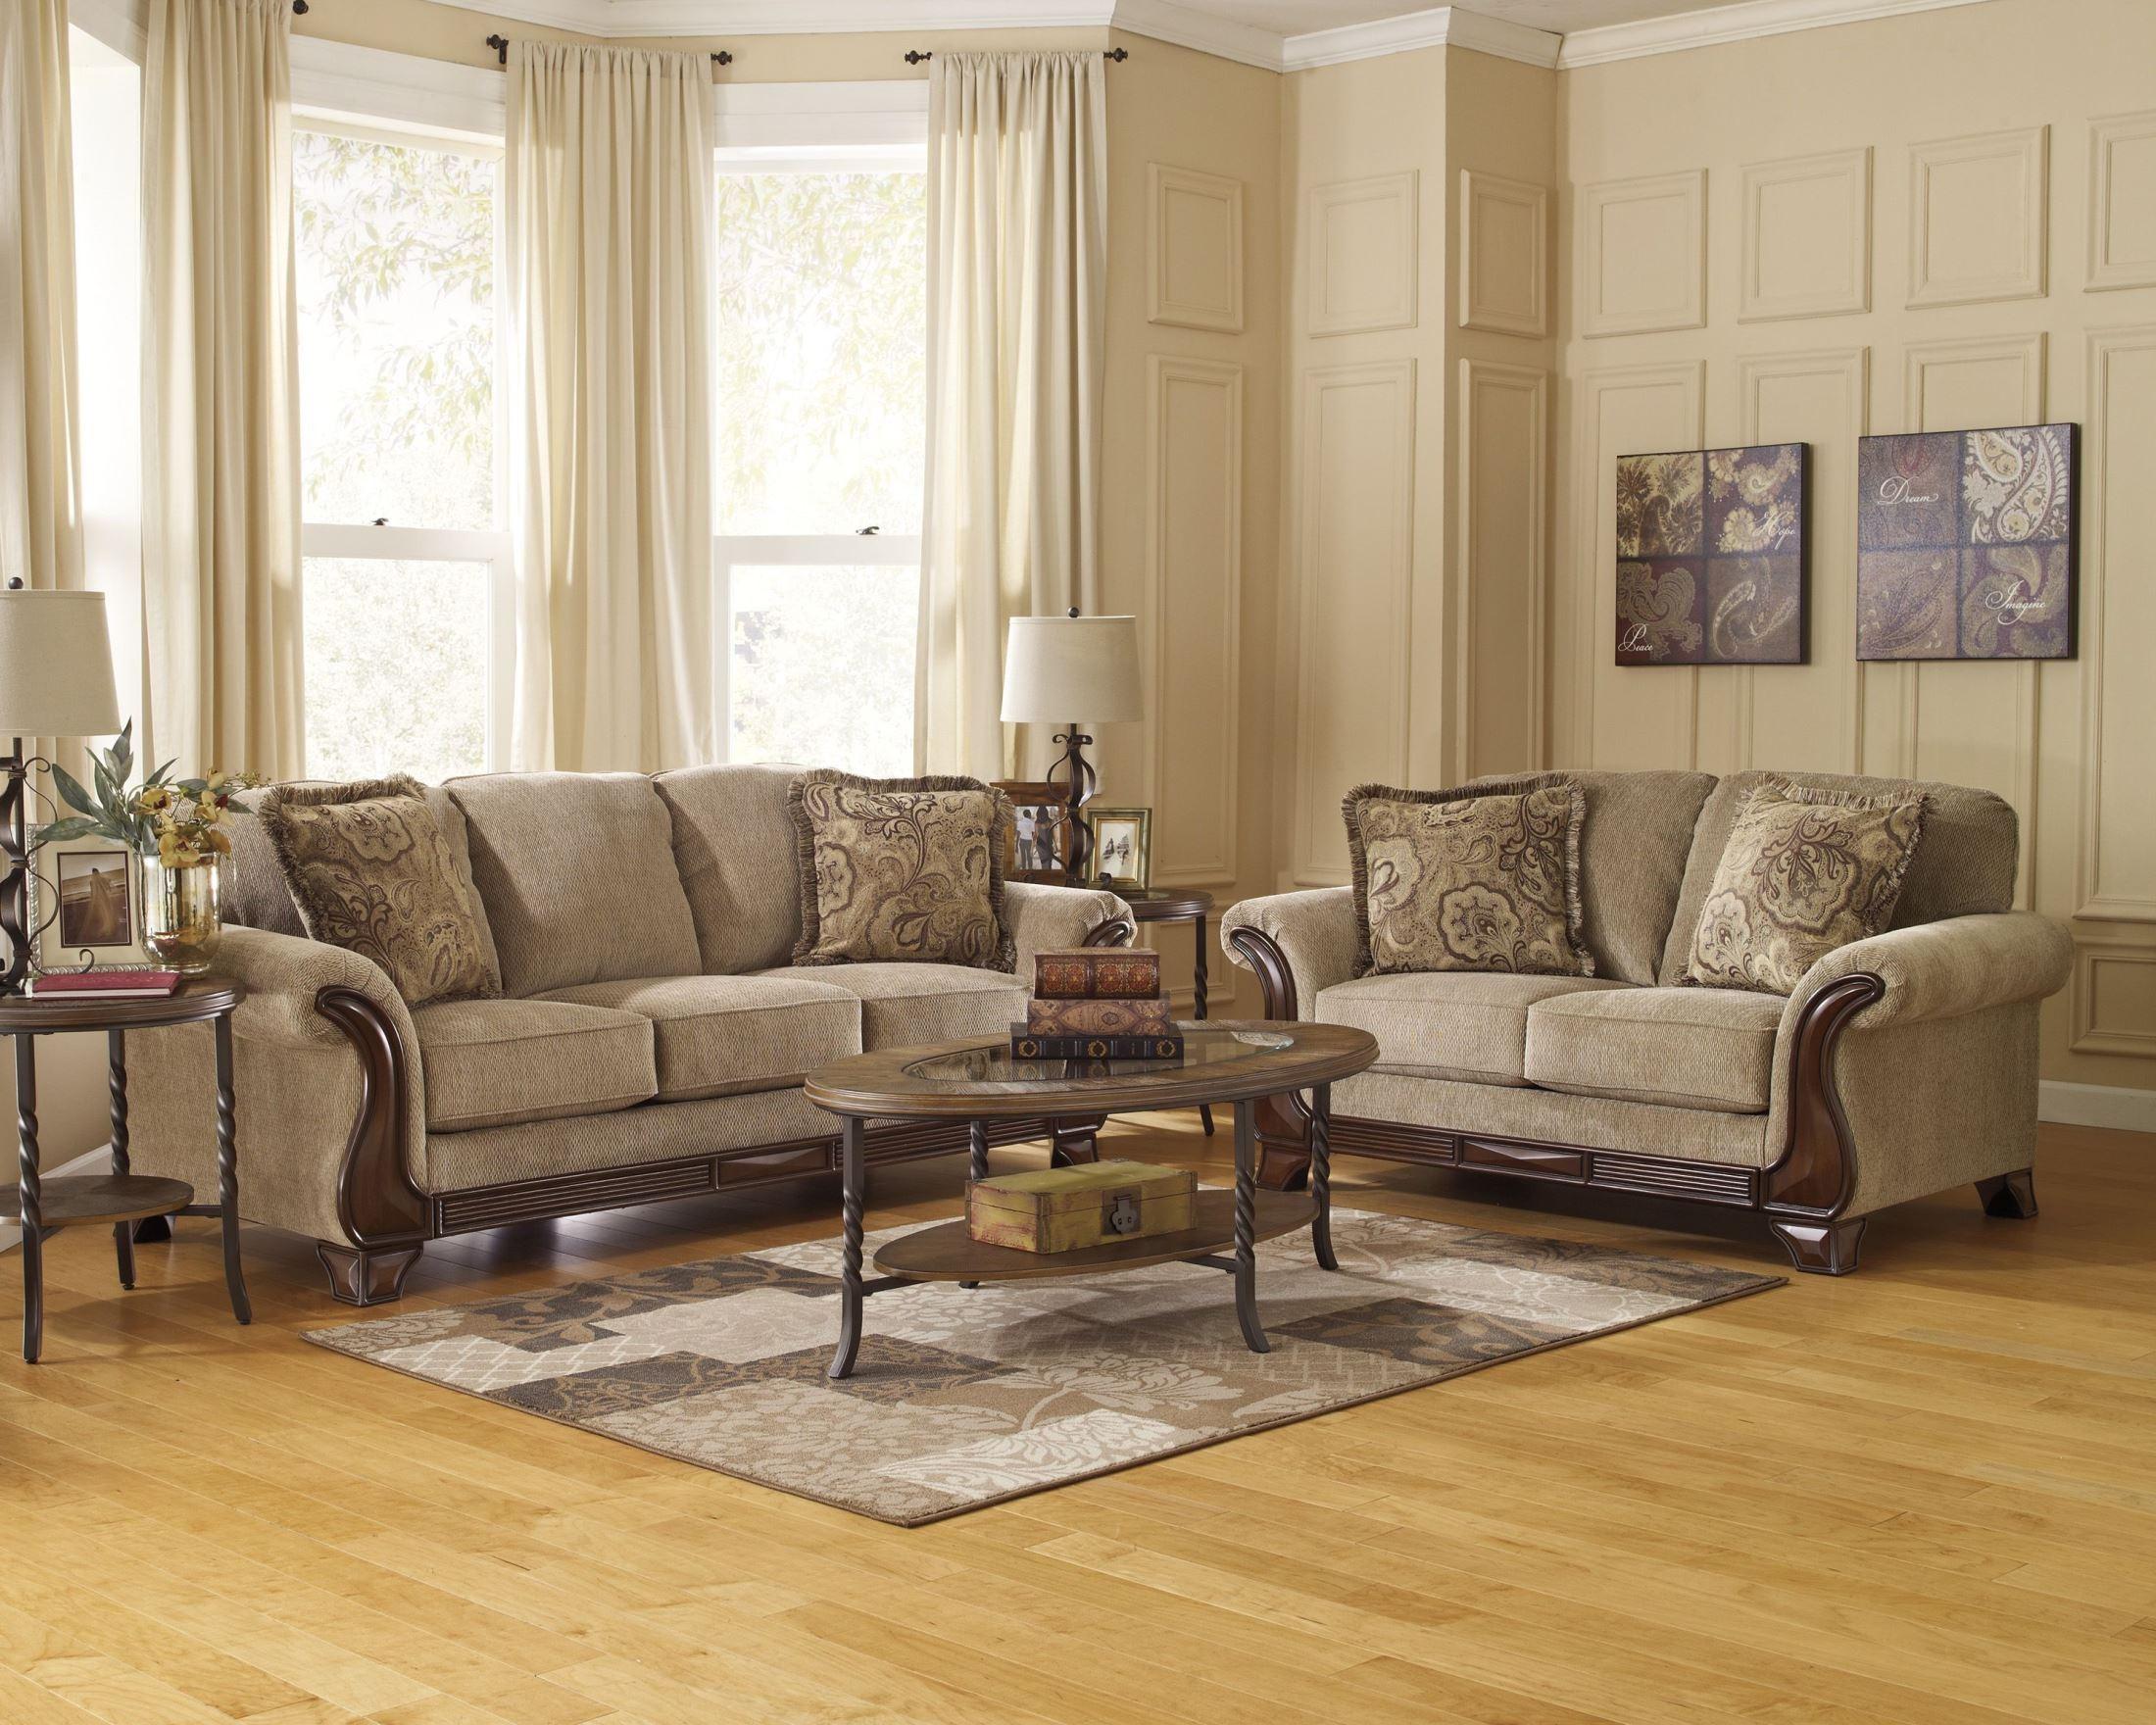 Lanett living room set from ashley 4490038 coleman - Living room furniture sets ashley ...